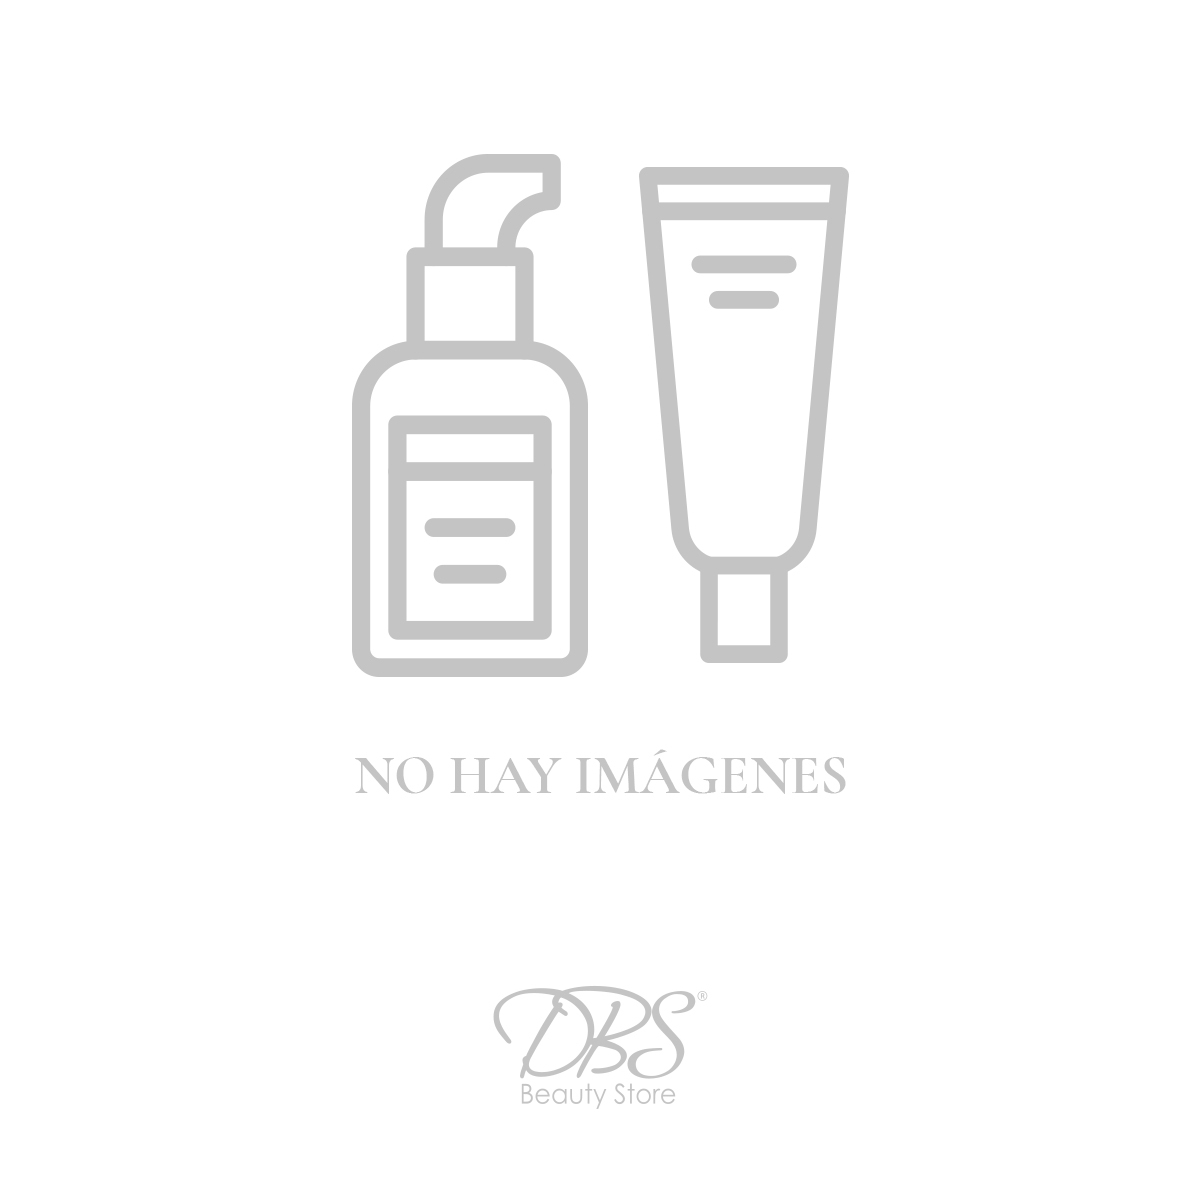 Desodorante Unisex 24H Aceite De Almendra Dulce 50 Ml